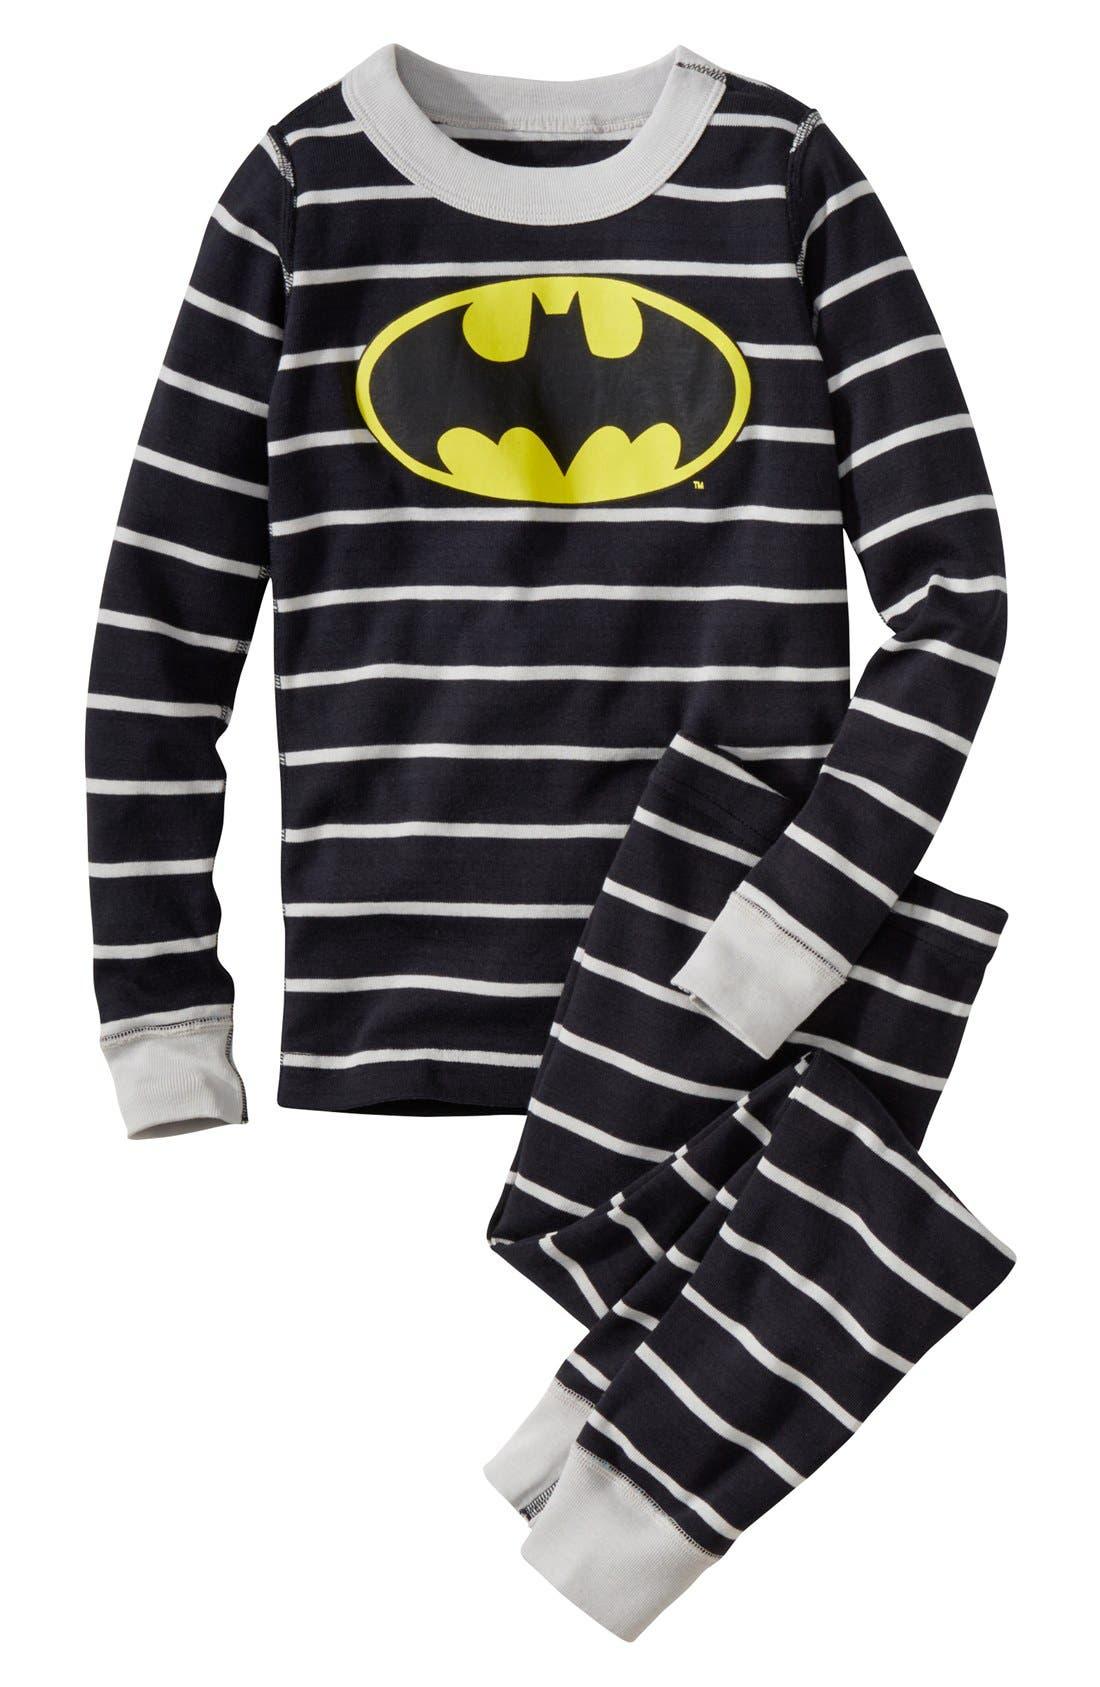 'DC Comics<sup>™</sup> Batman' Organic Cotton Fitted Two-Piece Pajamas,                             Main thumbnail 1, color,                             005